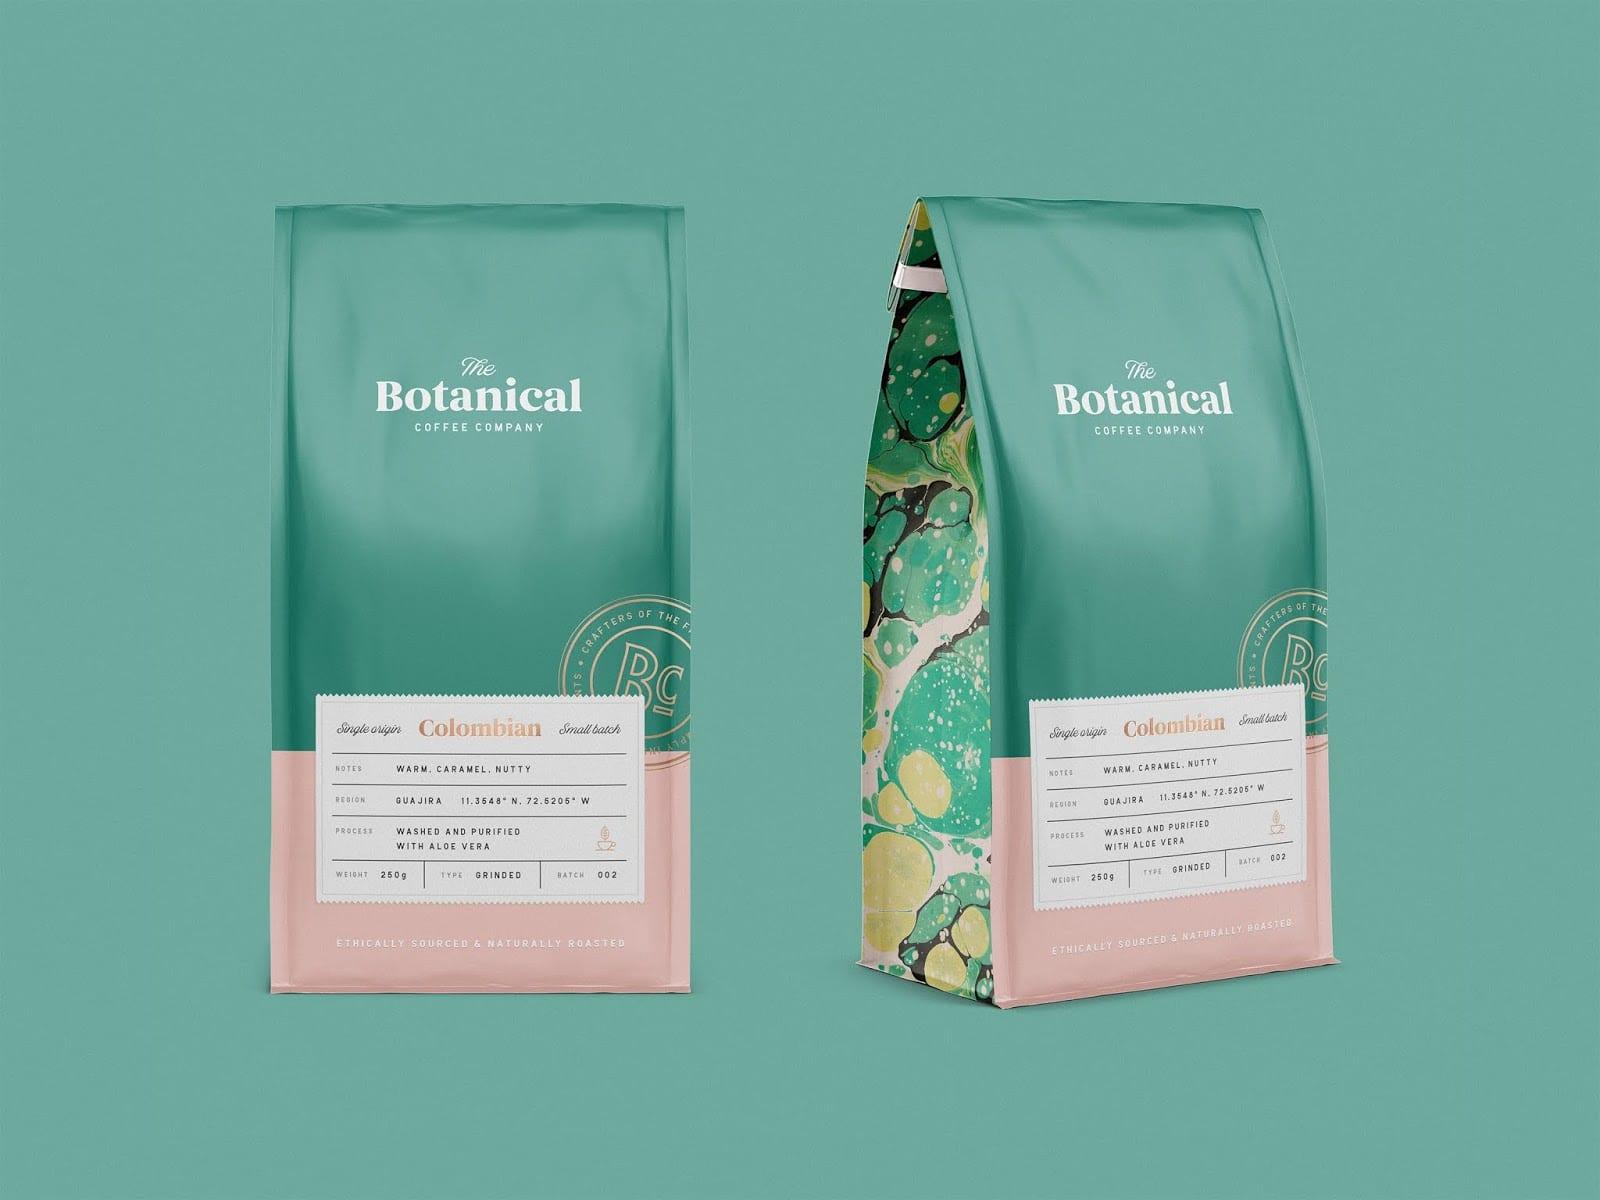 Botanical Coffee Co 02 - Ach, tie obaly – Botanical Coffee Co.